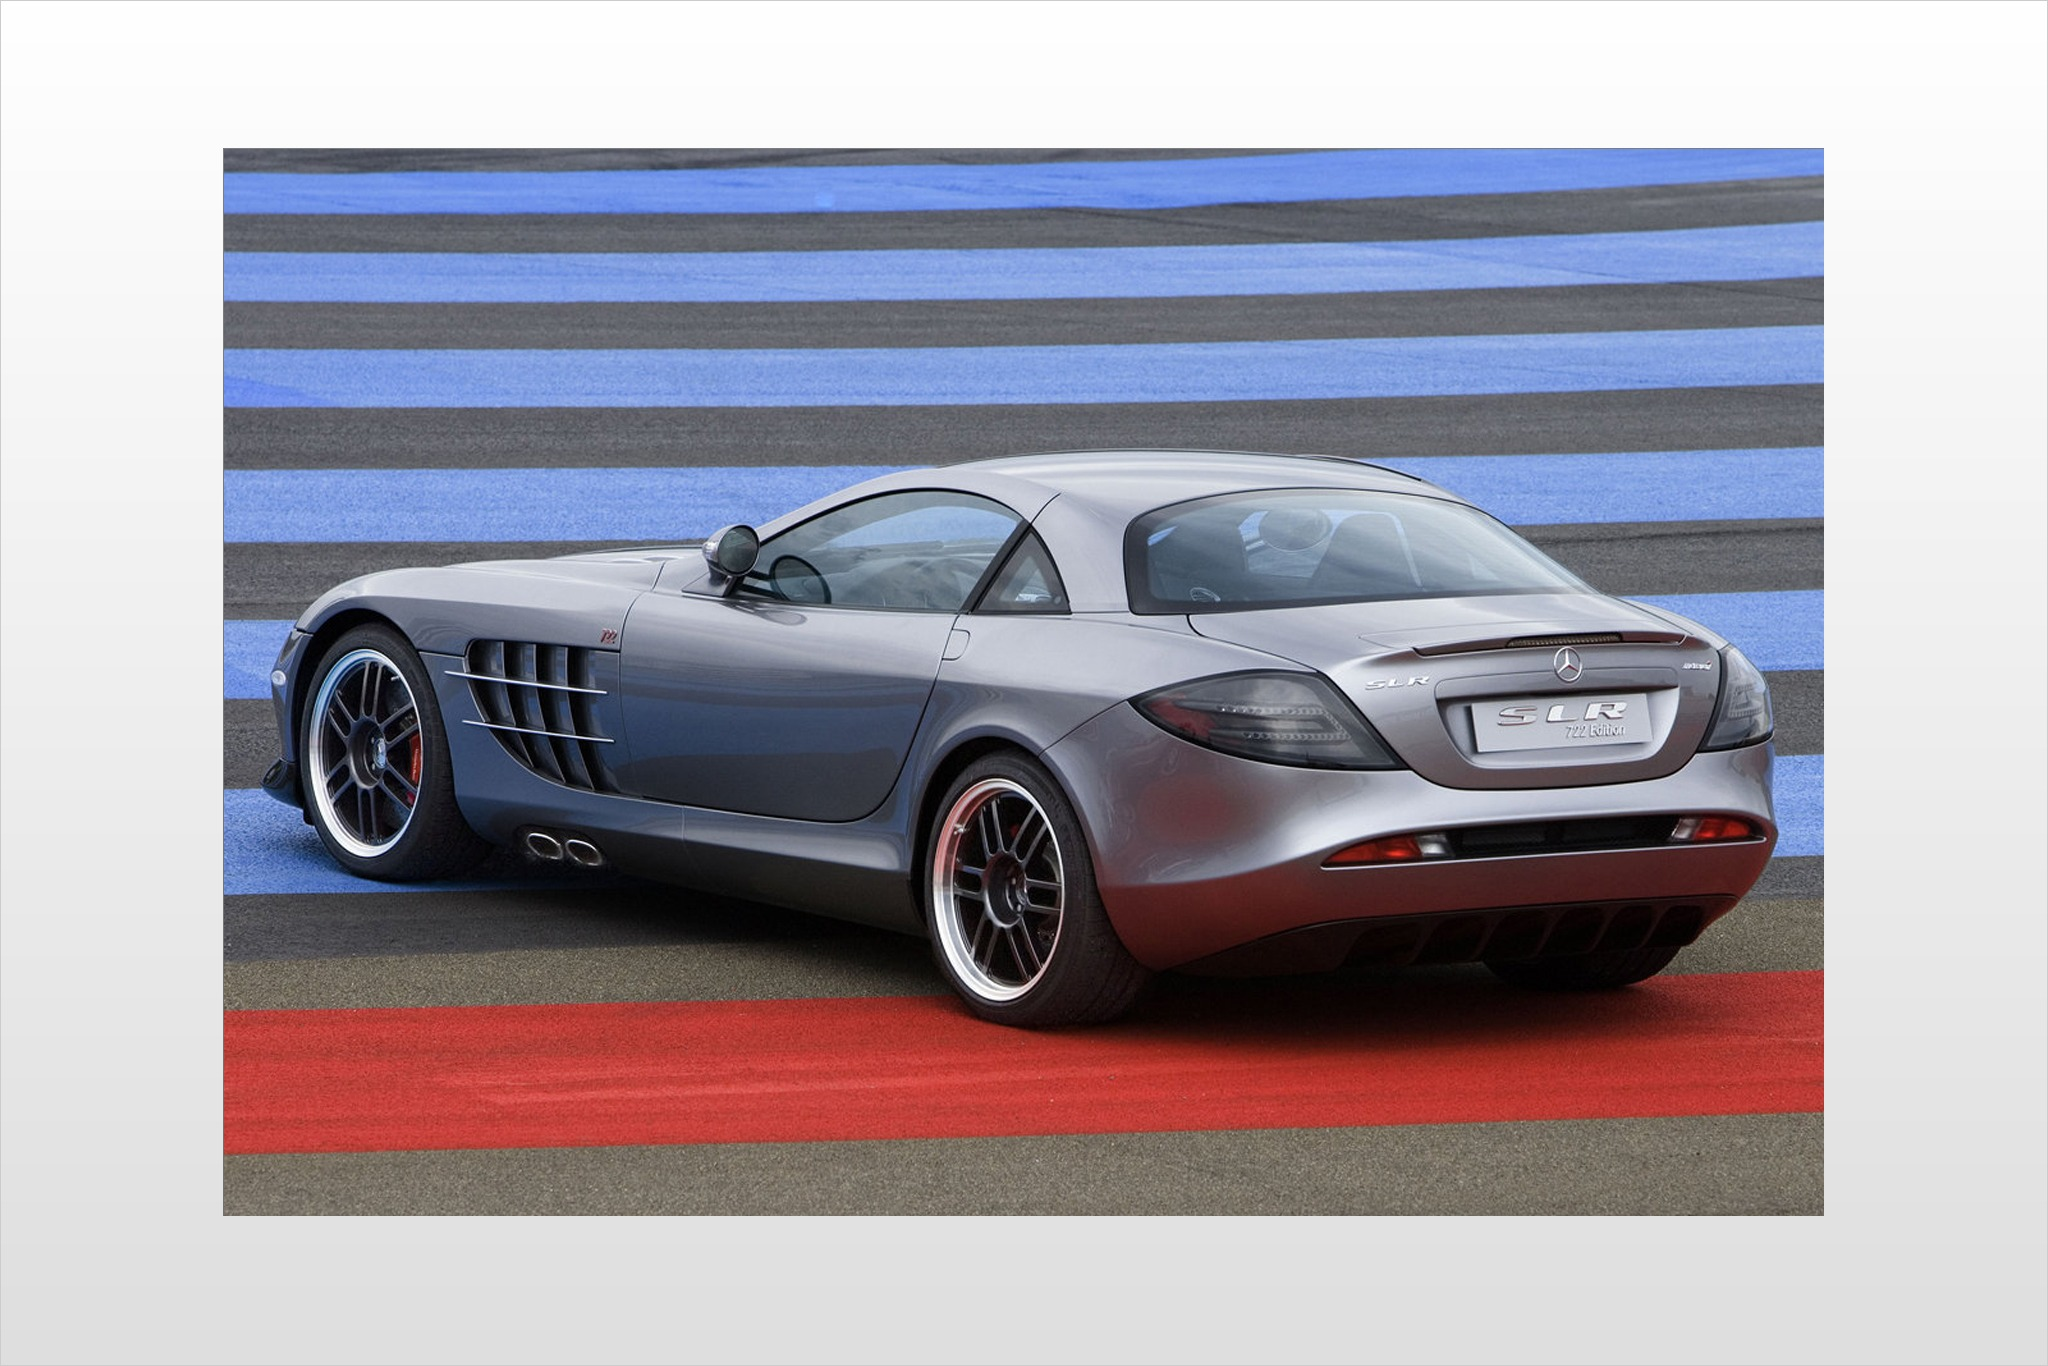 2007 Mercedes Benz Slr Mclaren Image 4